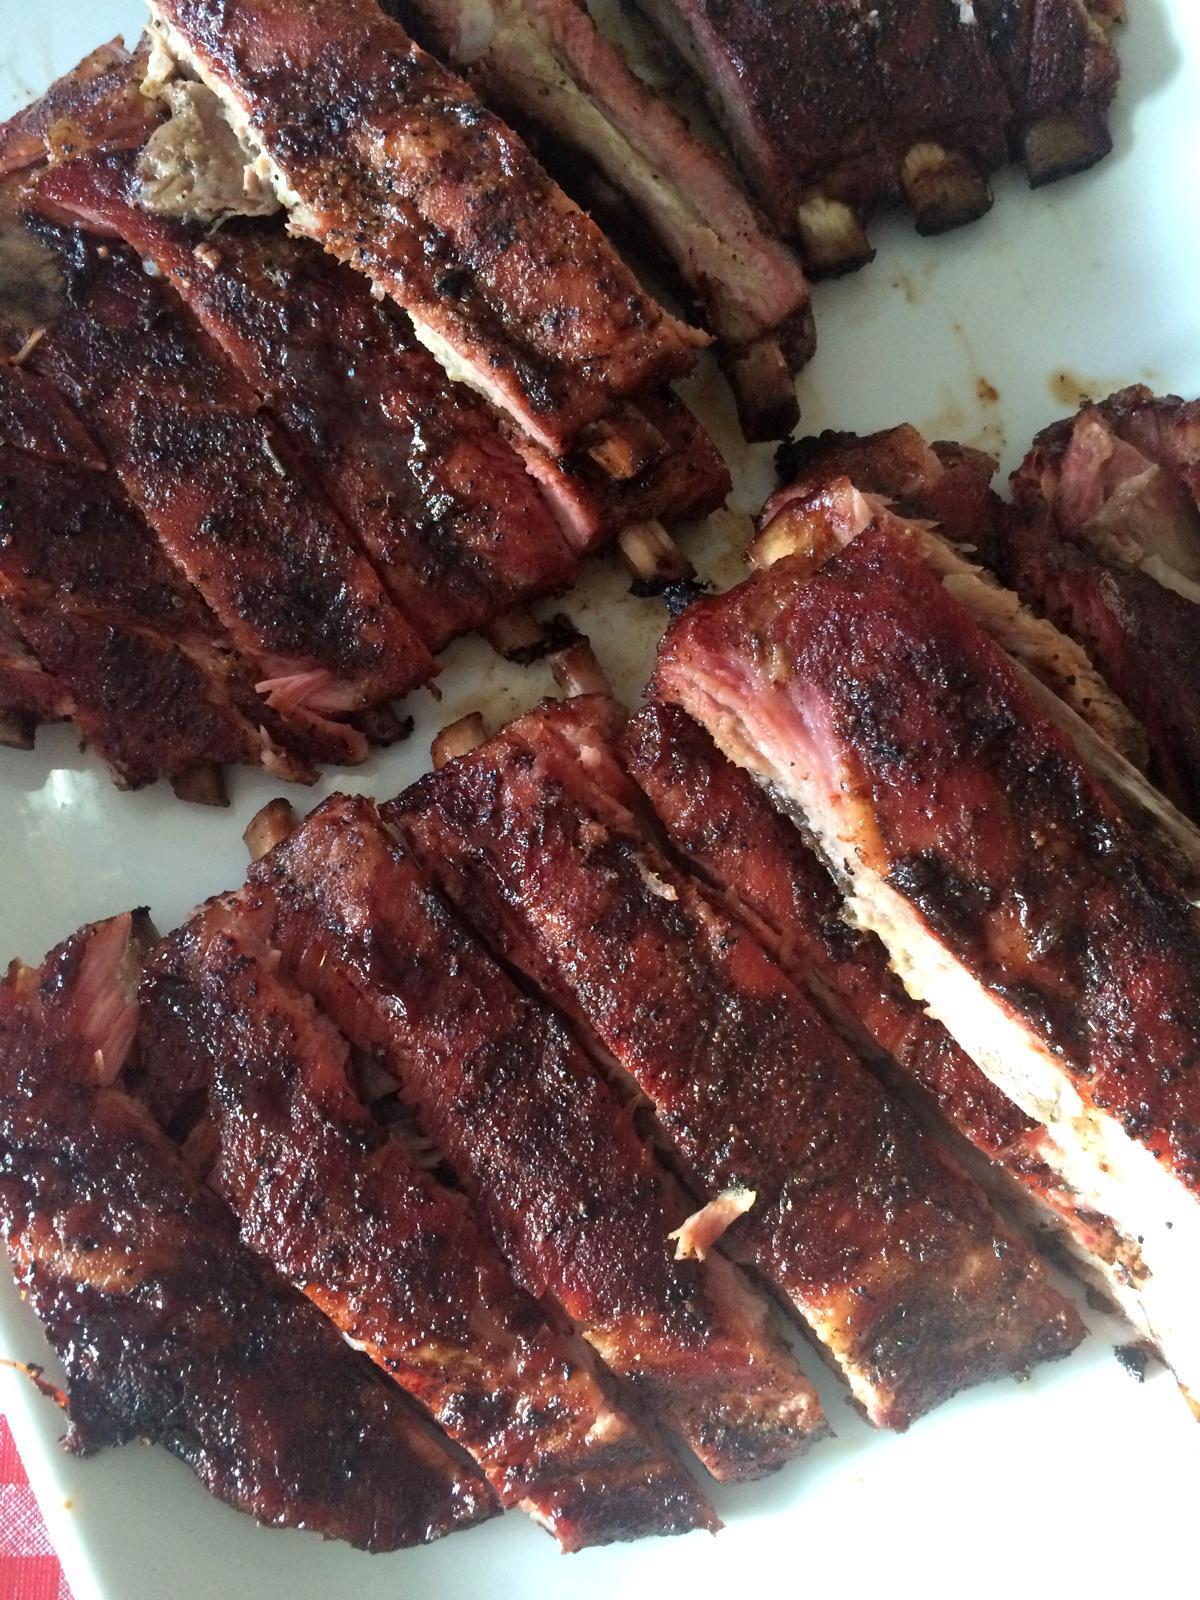 BBQ Season Is Here! Here's How You Smoke Cannabis-Infused Pork Ribs